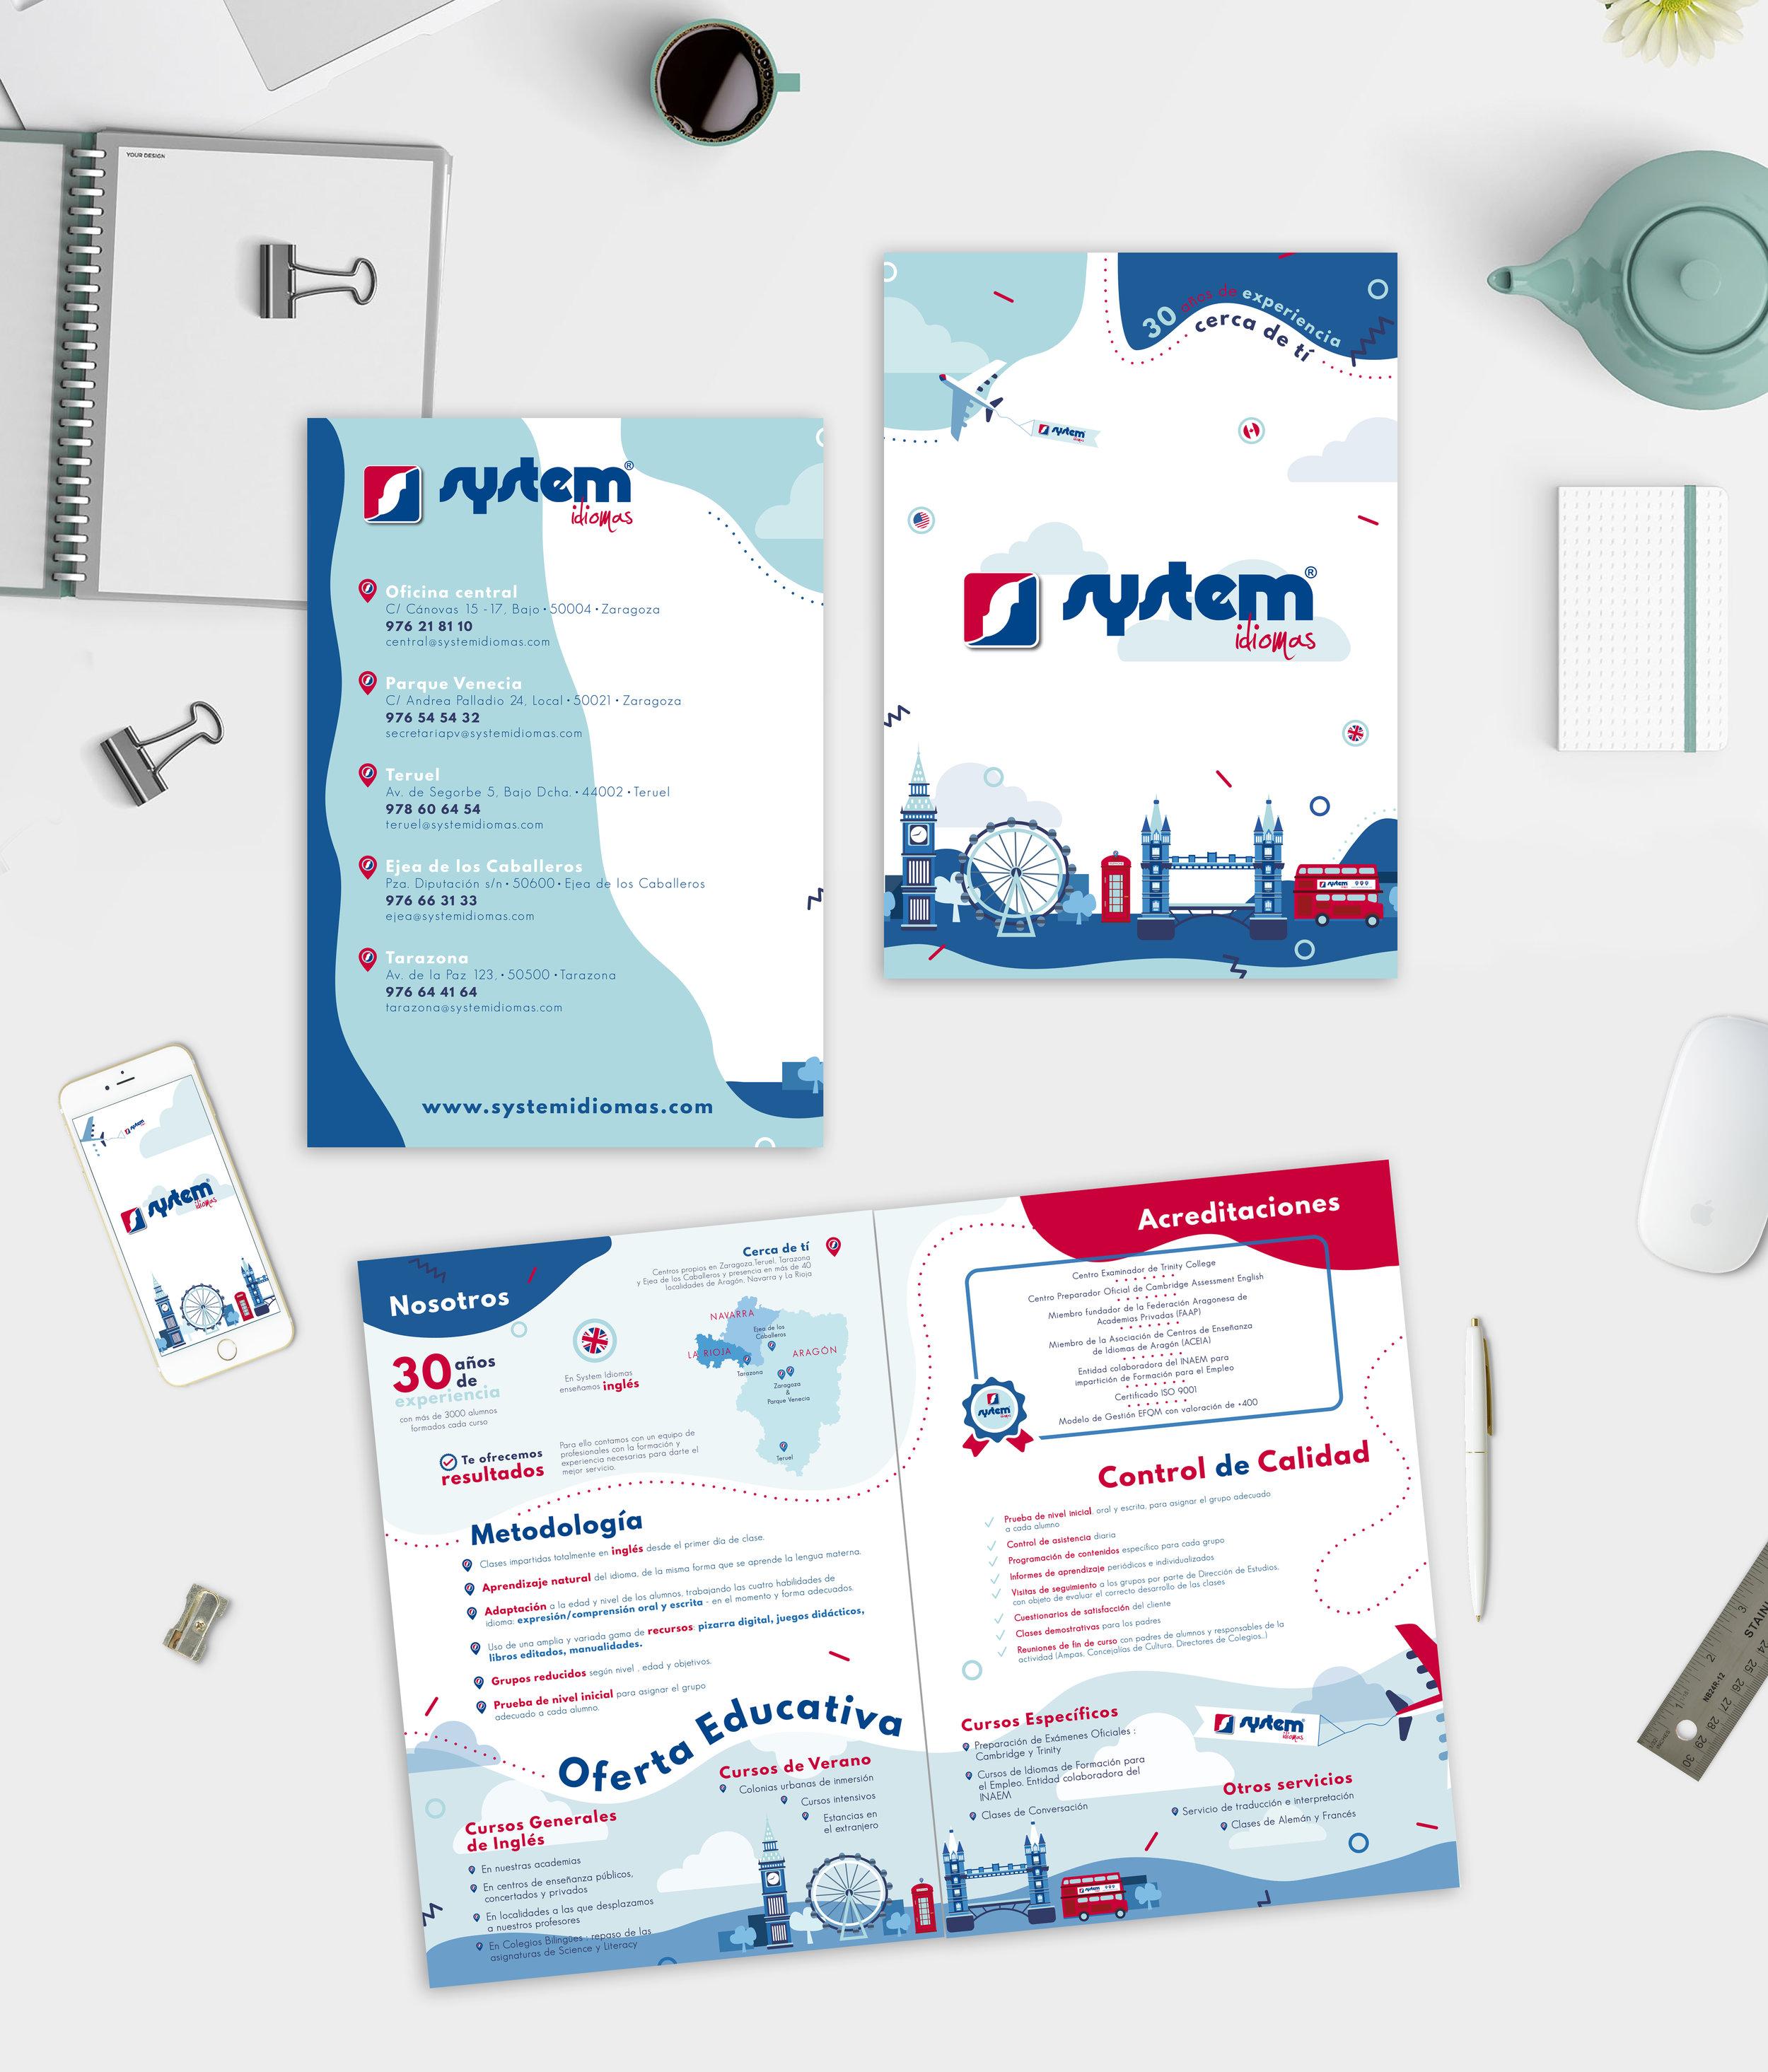 System Idiomas folleto_Holyoke Paper Co.